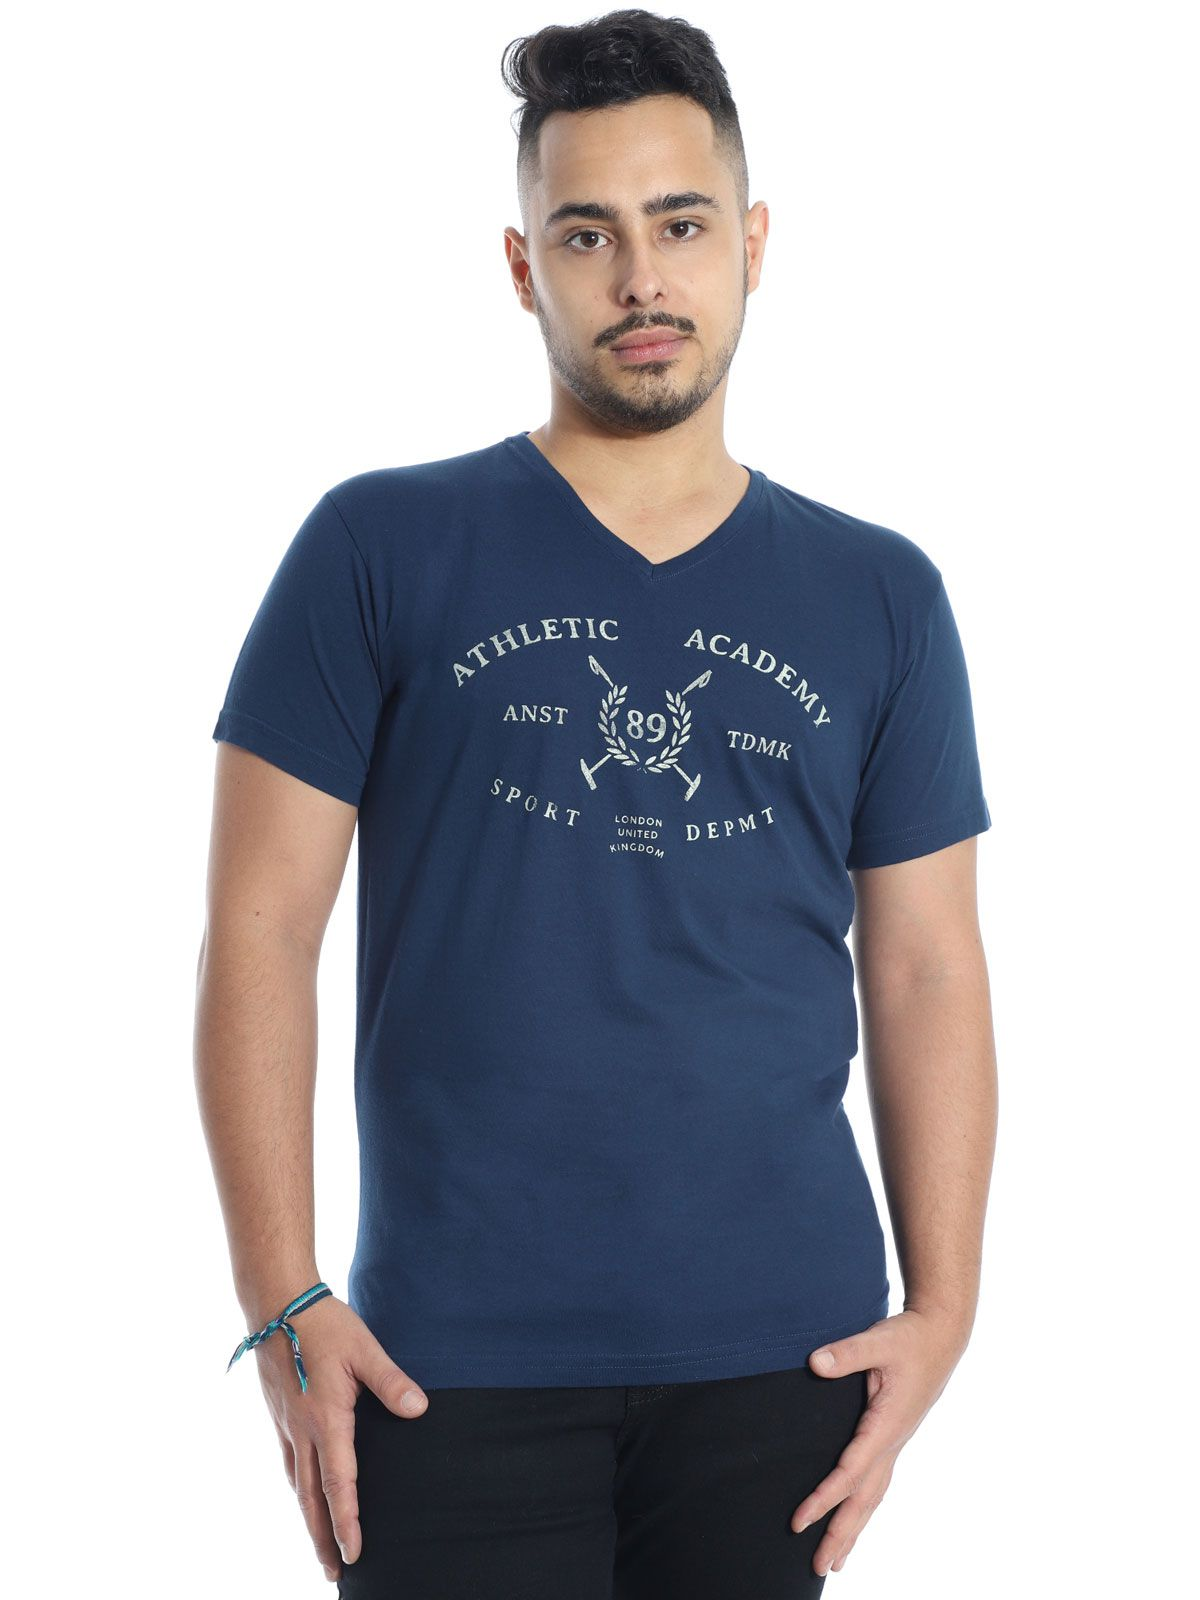 Camiseta Masculina Slim Fit Decote V. Anistia England Marinho